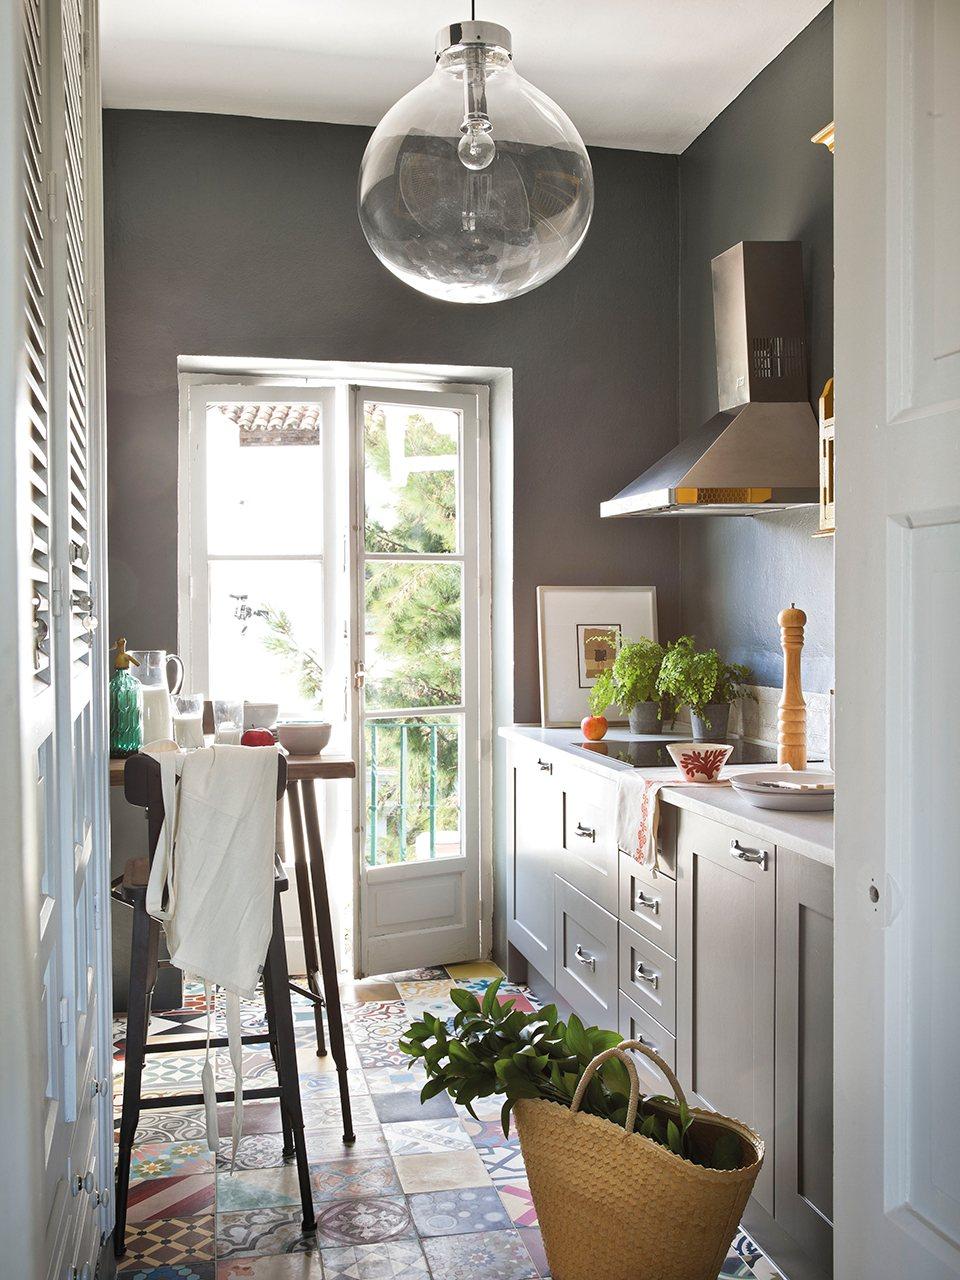 Las mejores ideas para pintar la casa - Muebles grises paredes color ...